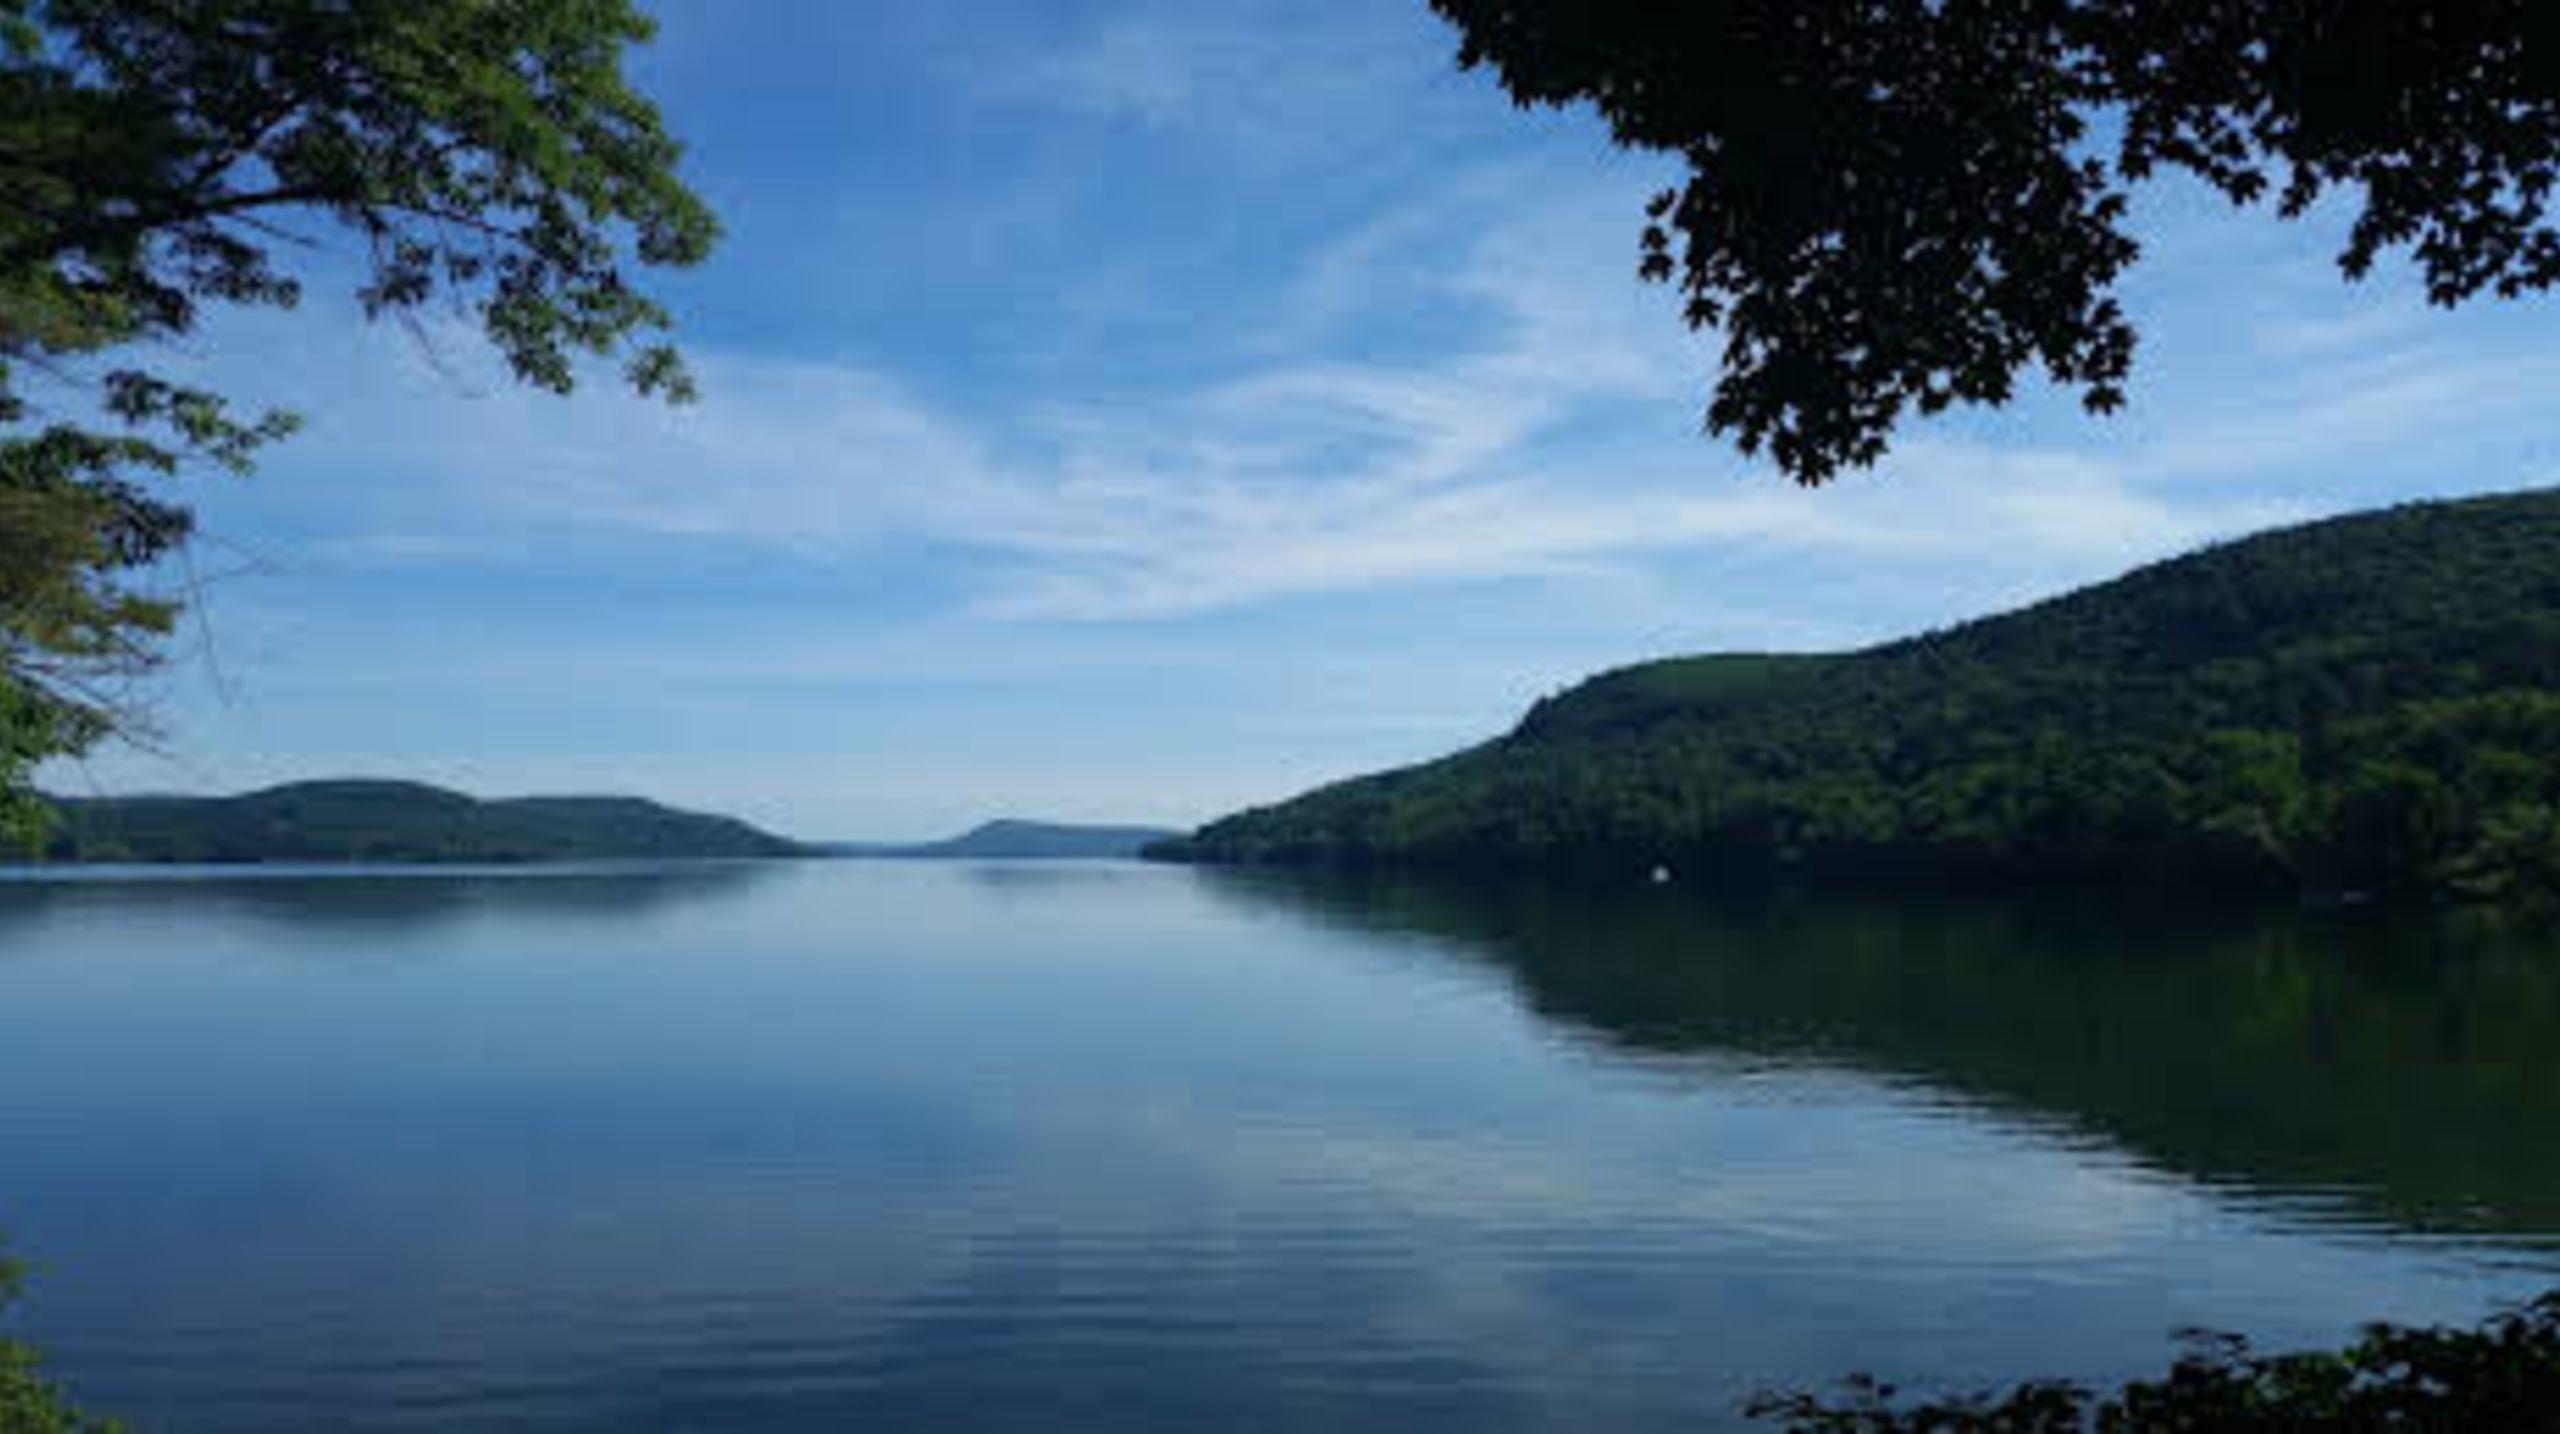 Glimmerglass Lake